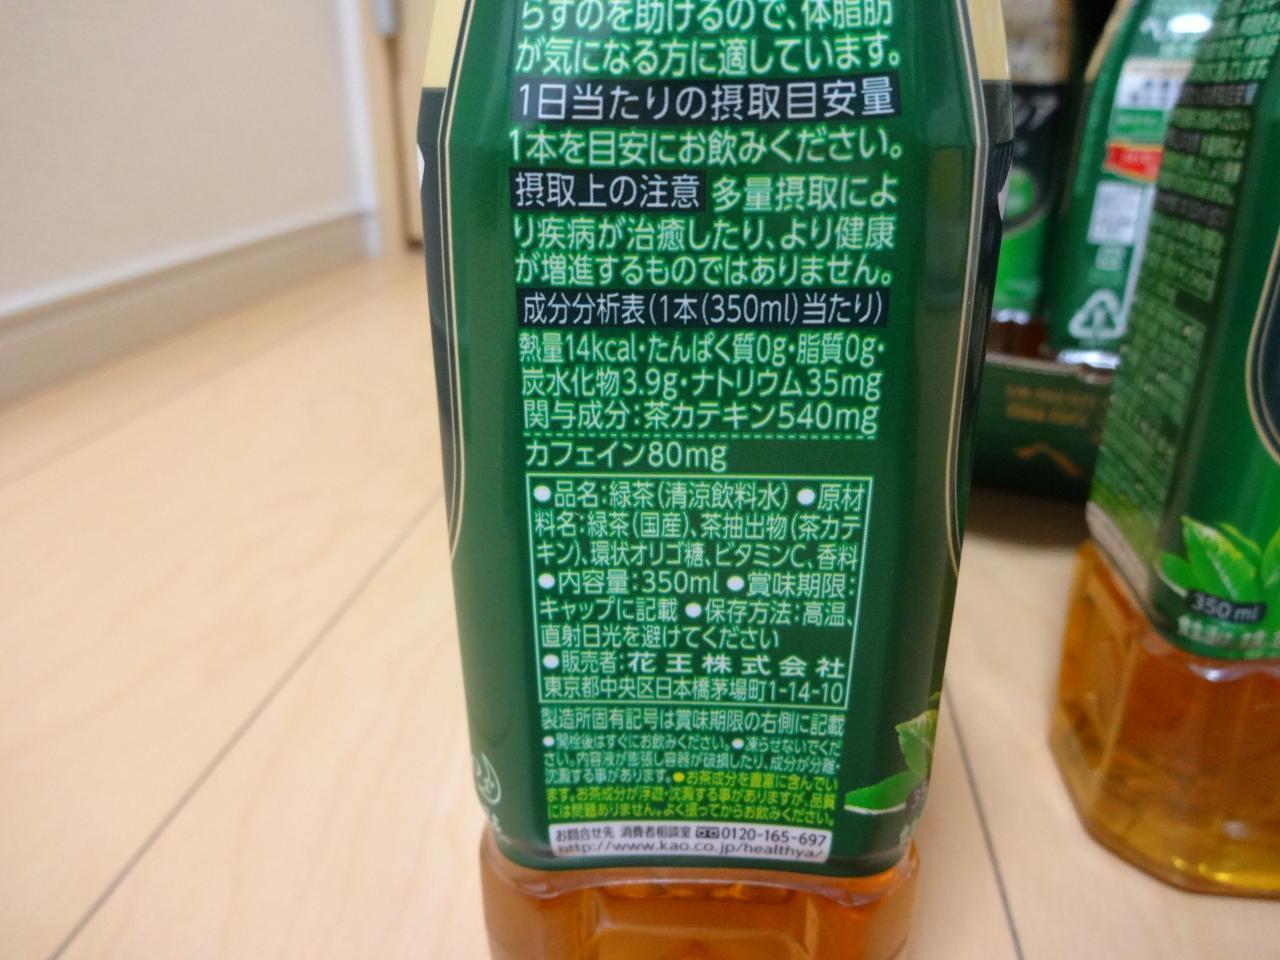 新ヘルシア緑茶20160822-004